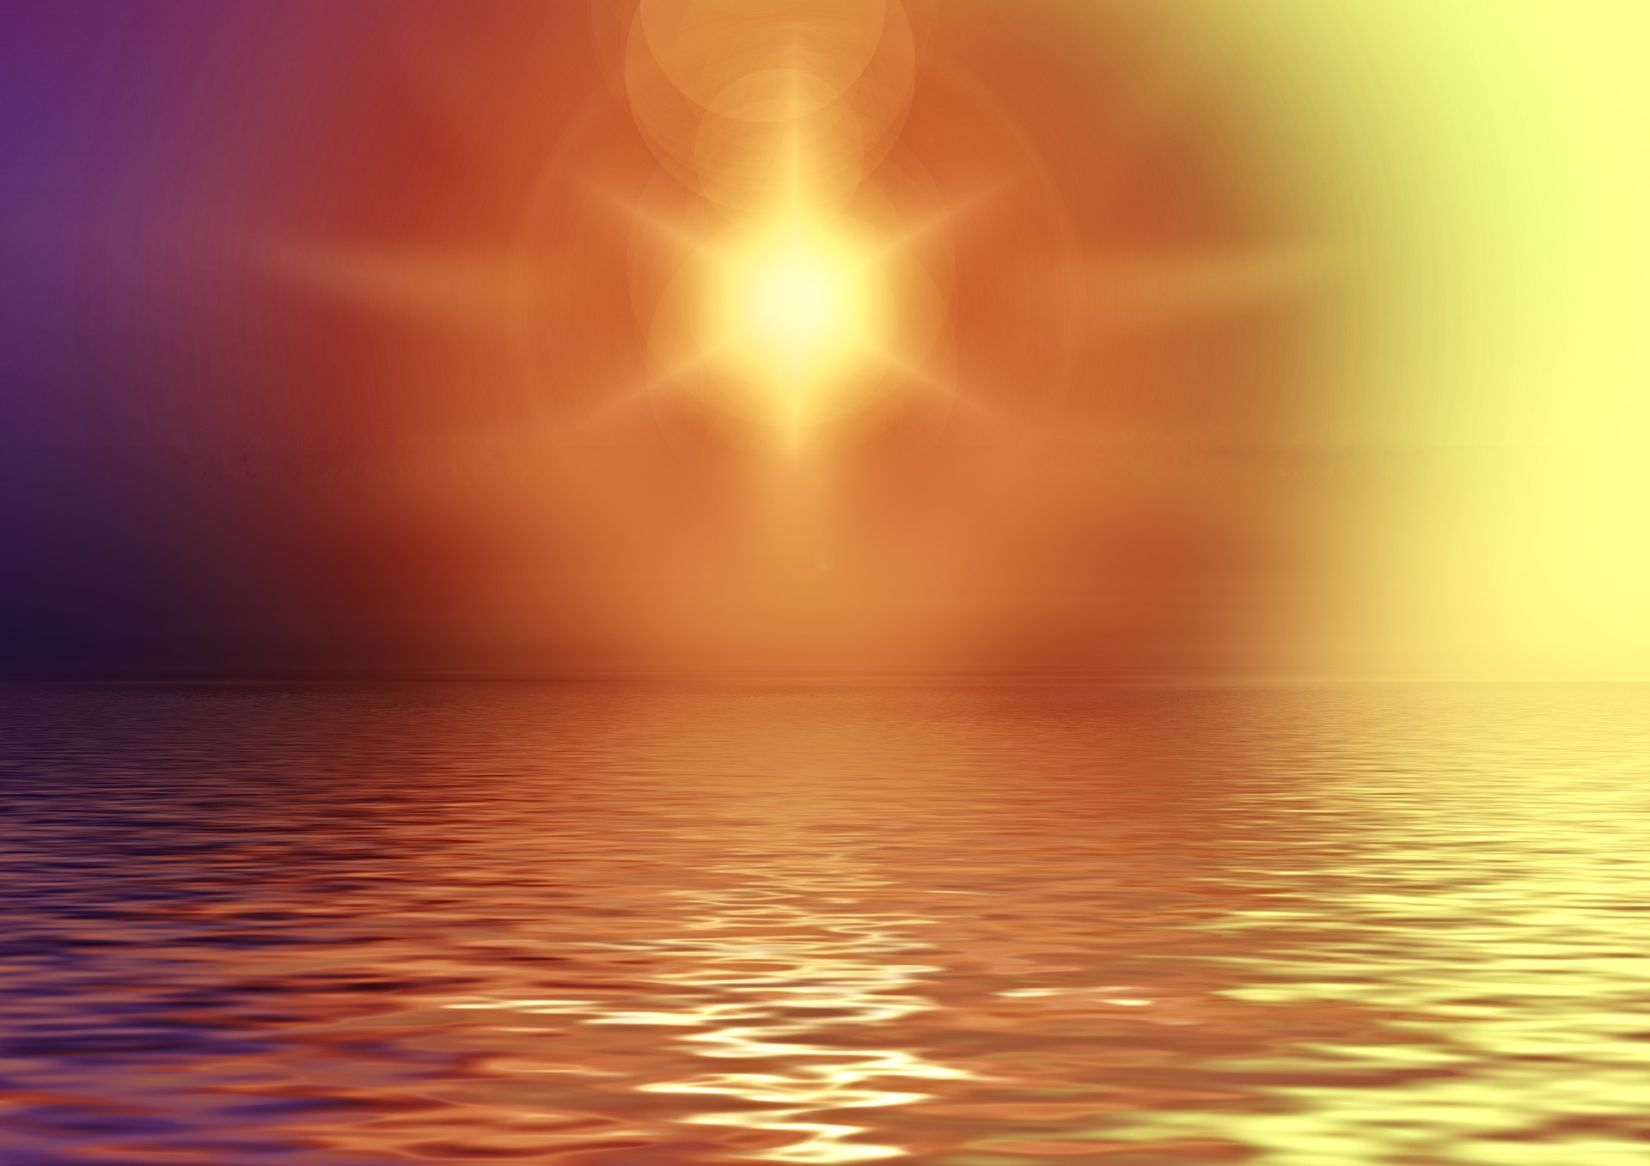 ramona-mckean-author-blogger-sunset-photo-1650x1166